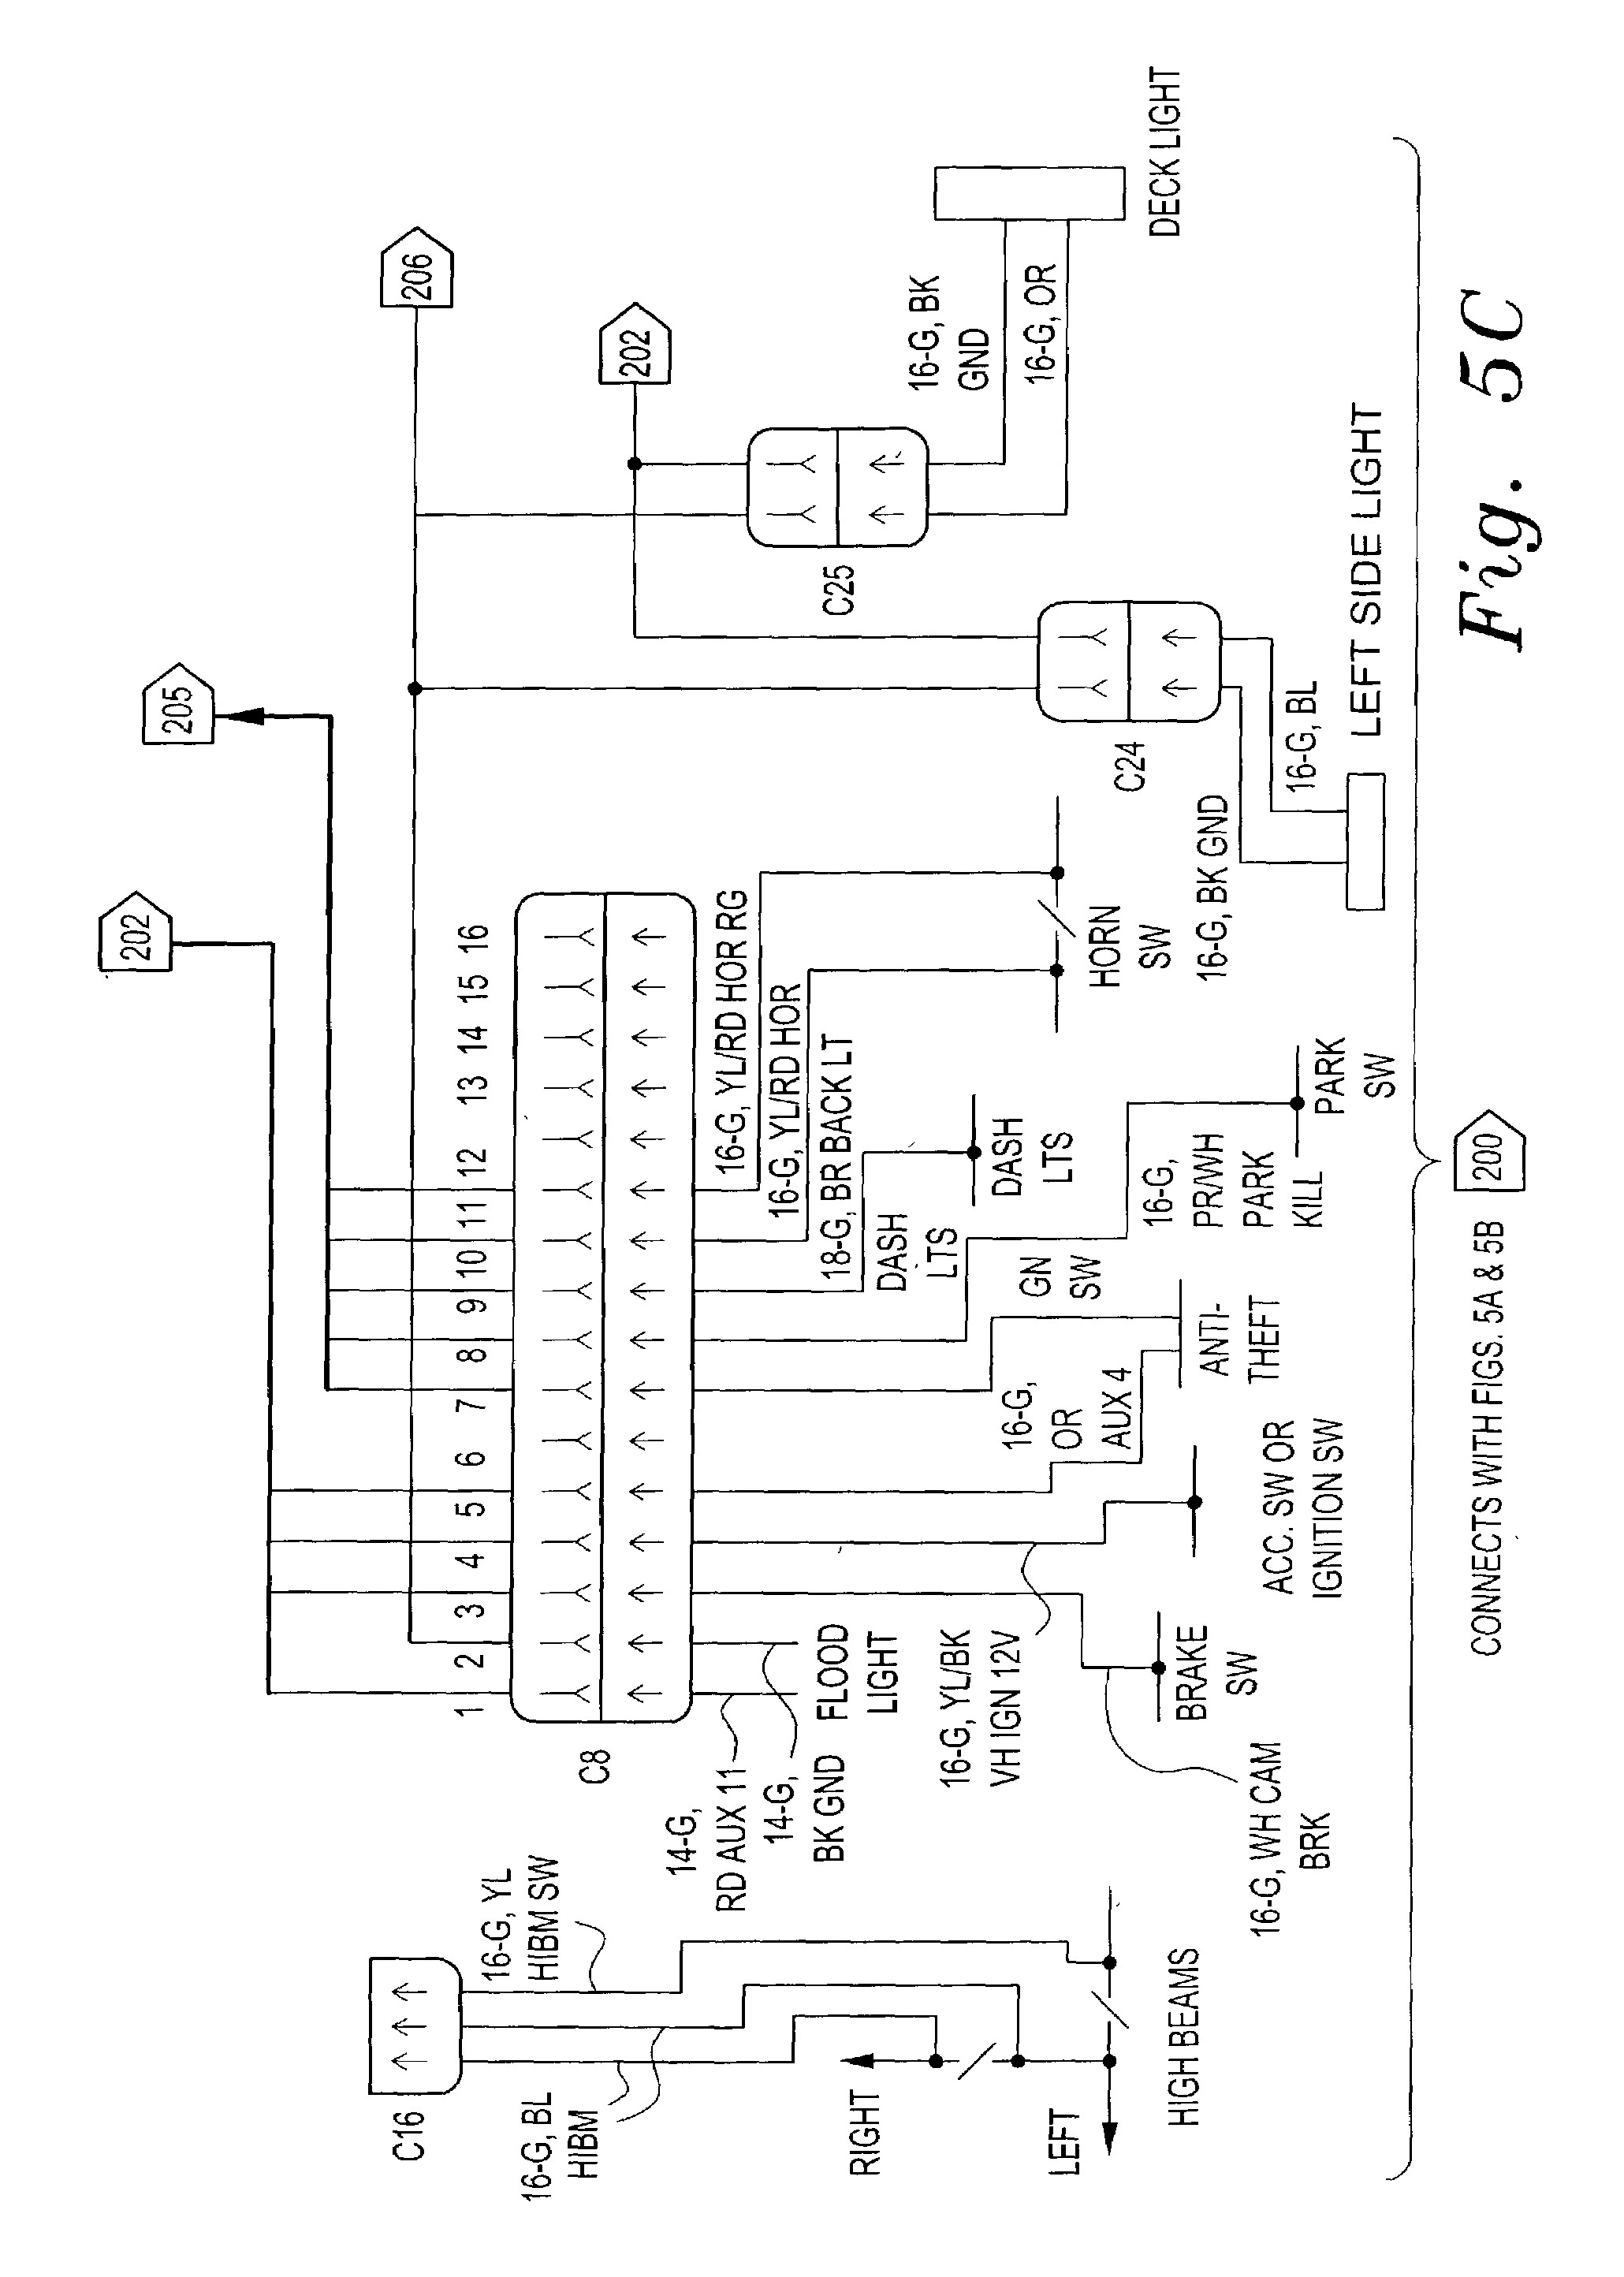 b8d9 whelen 295hfs4 wiring diagram model | wiring resources  wiring resources